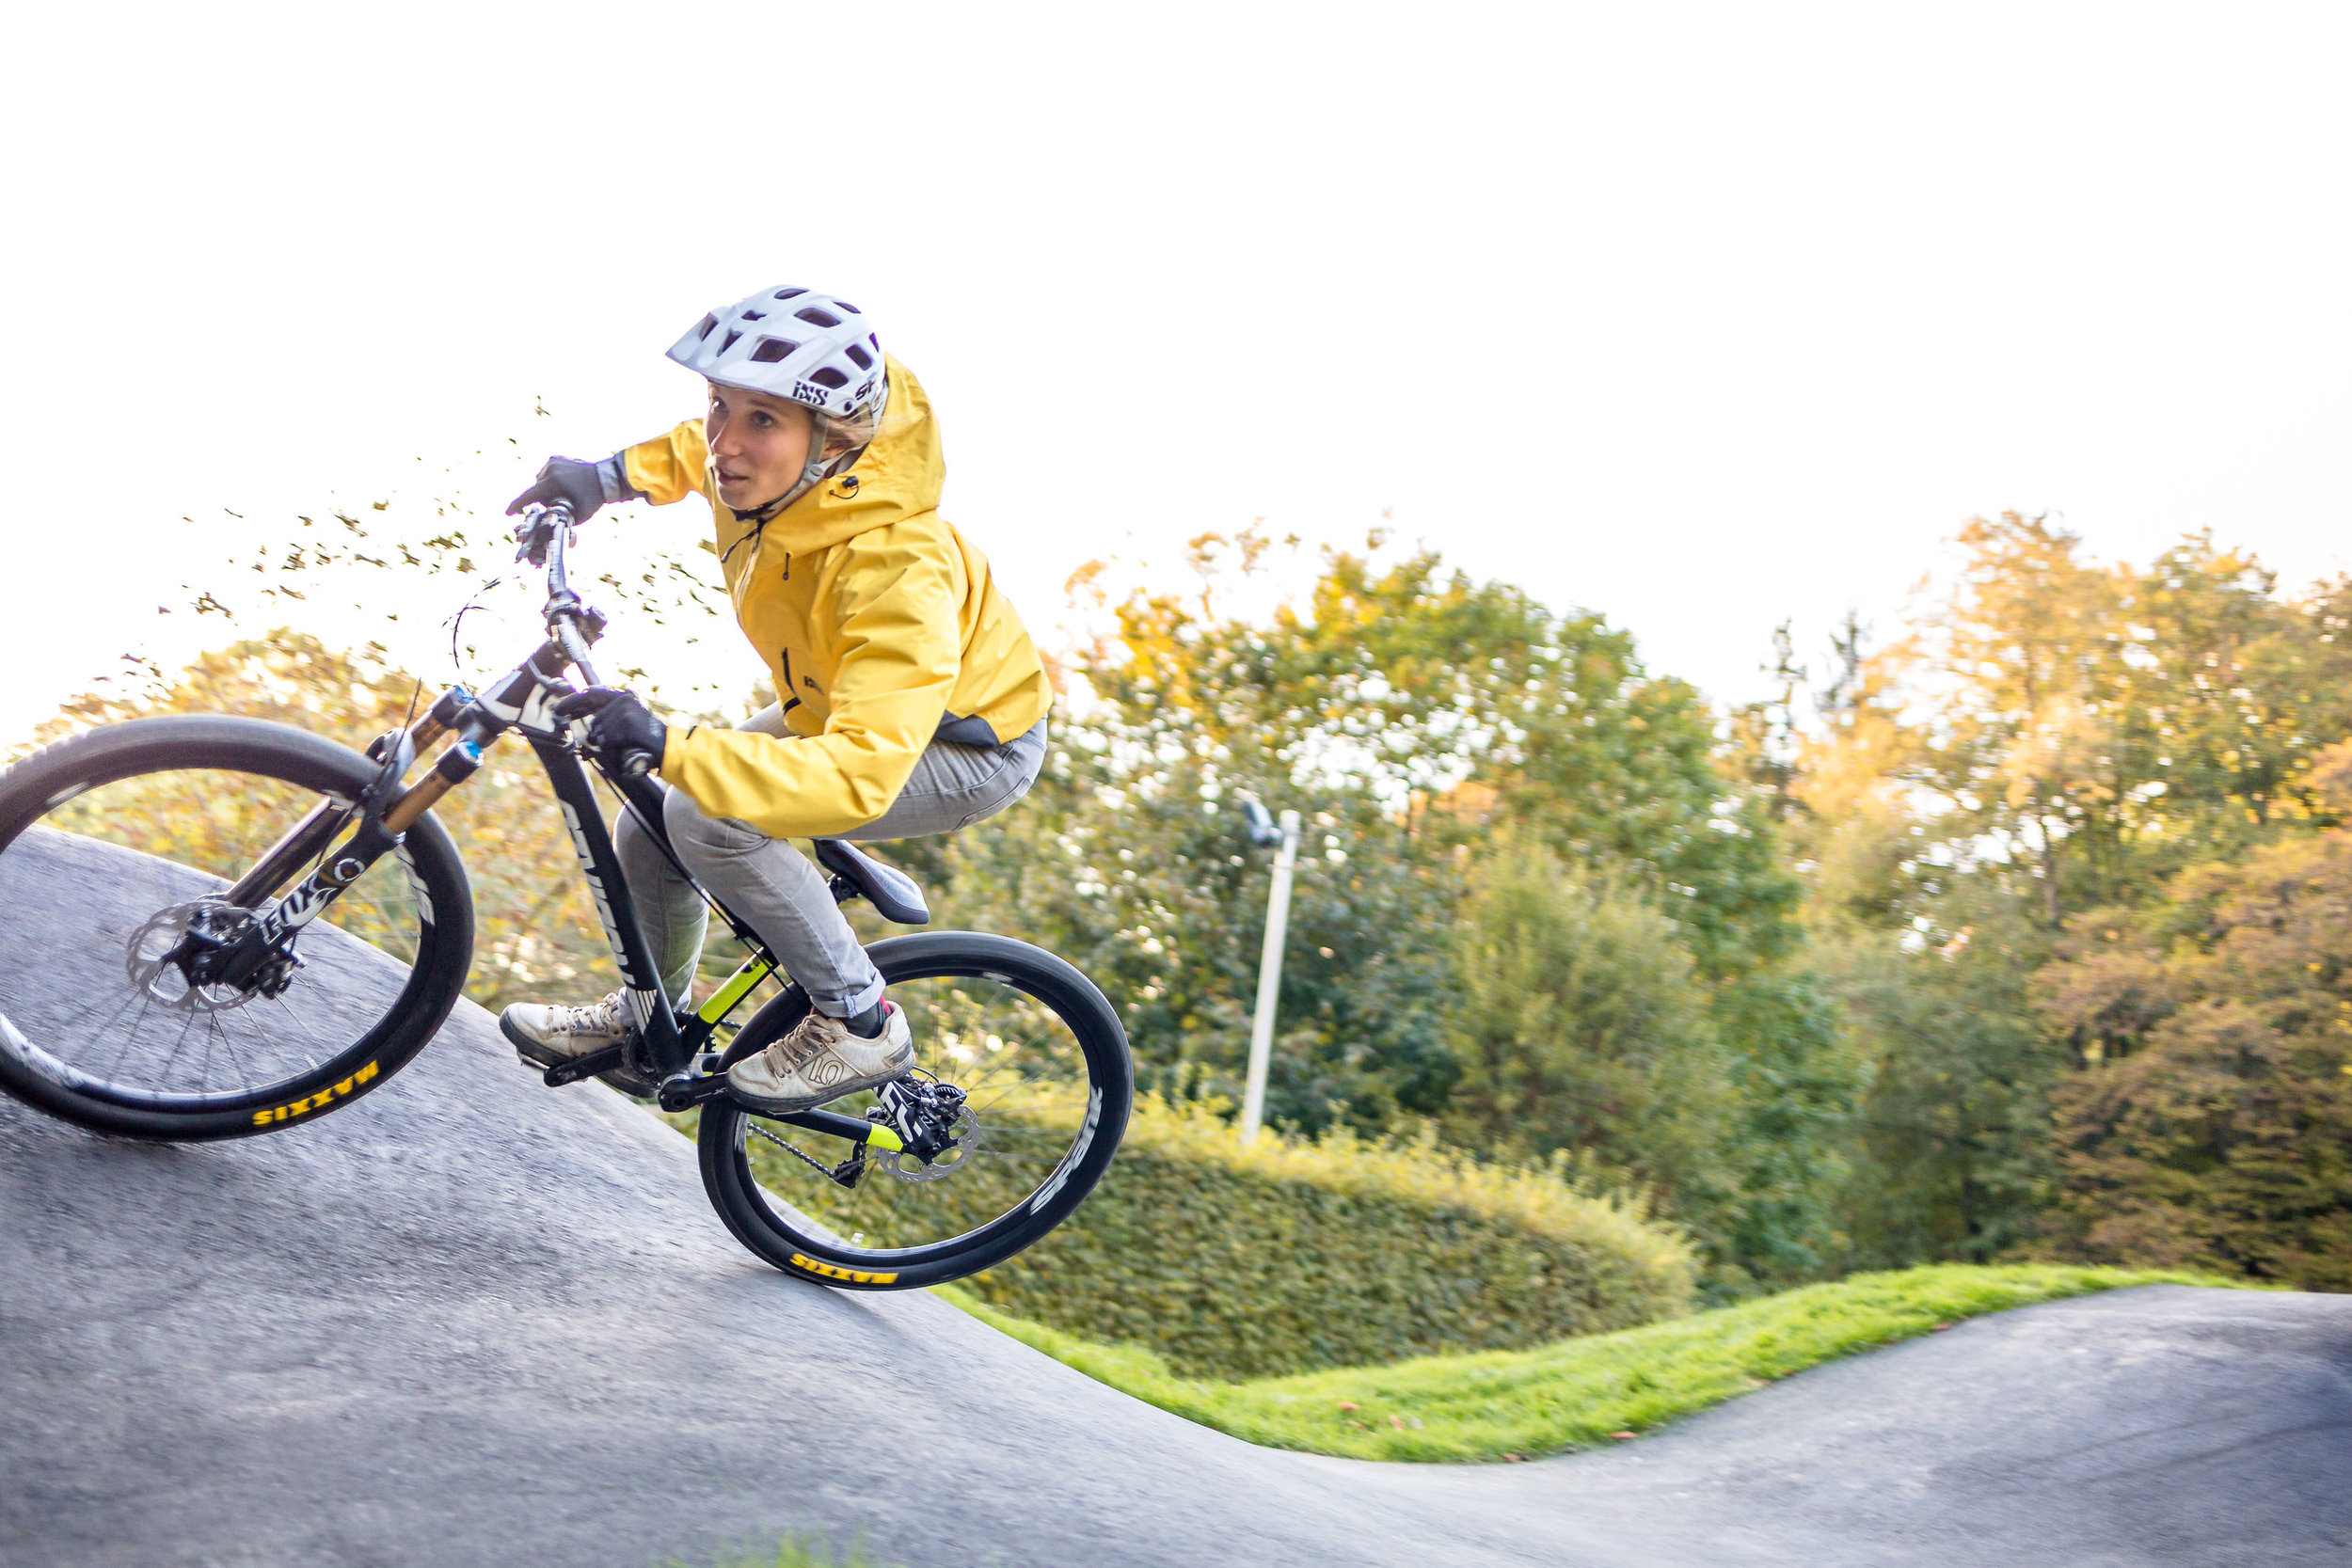 pumptrack-biking-heubach-4.jpg